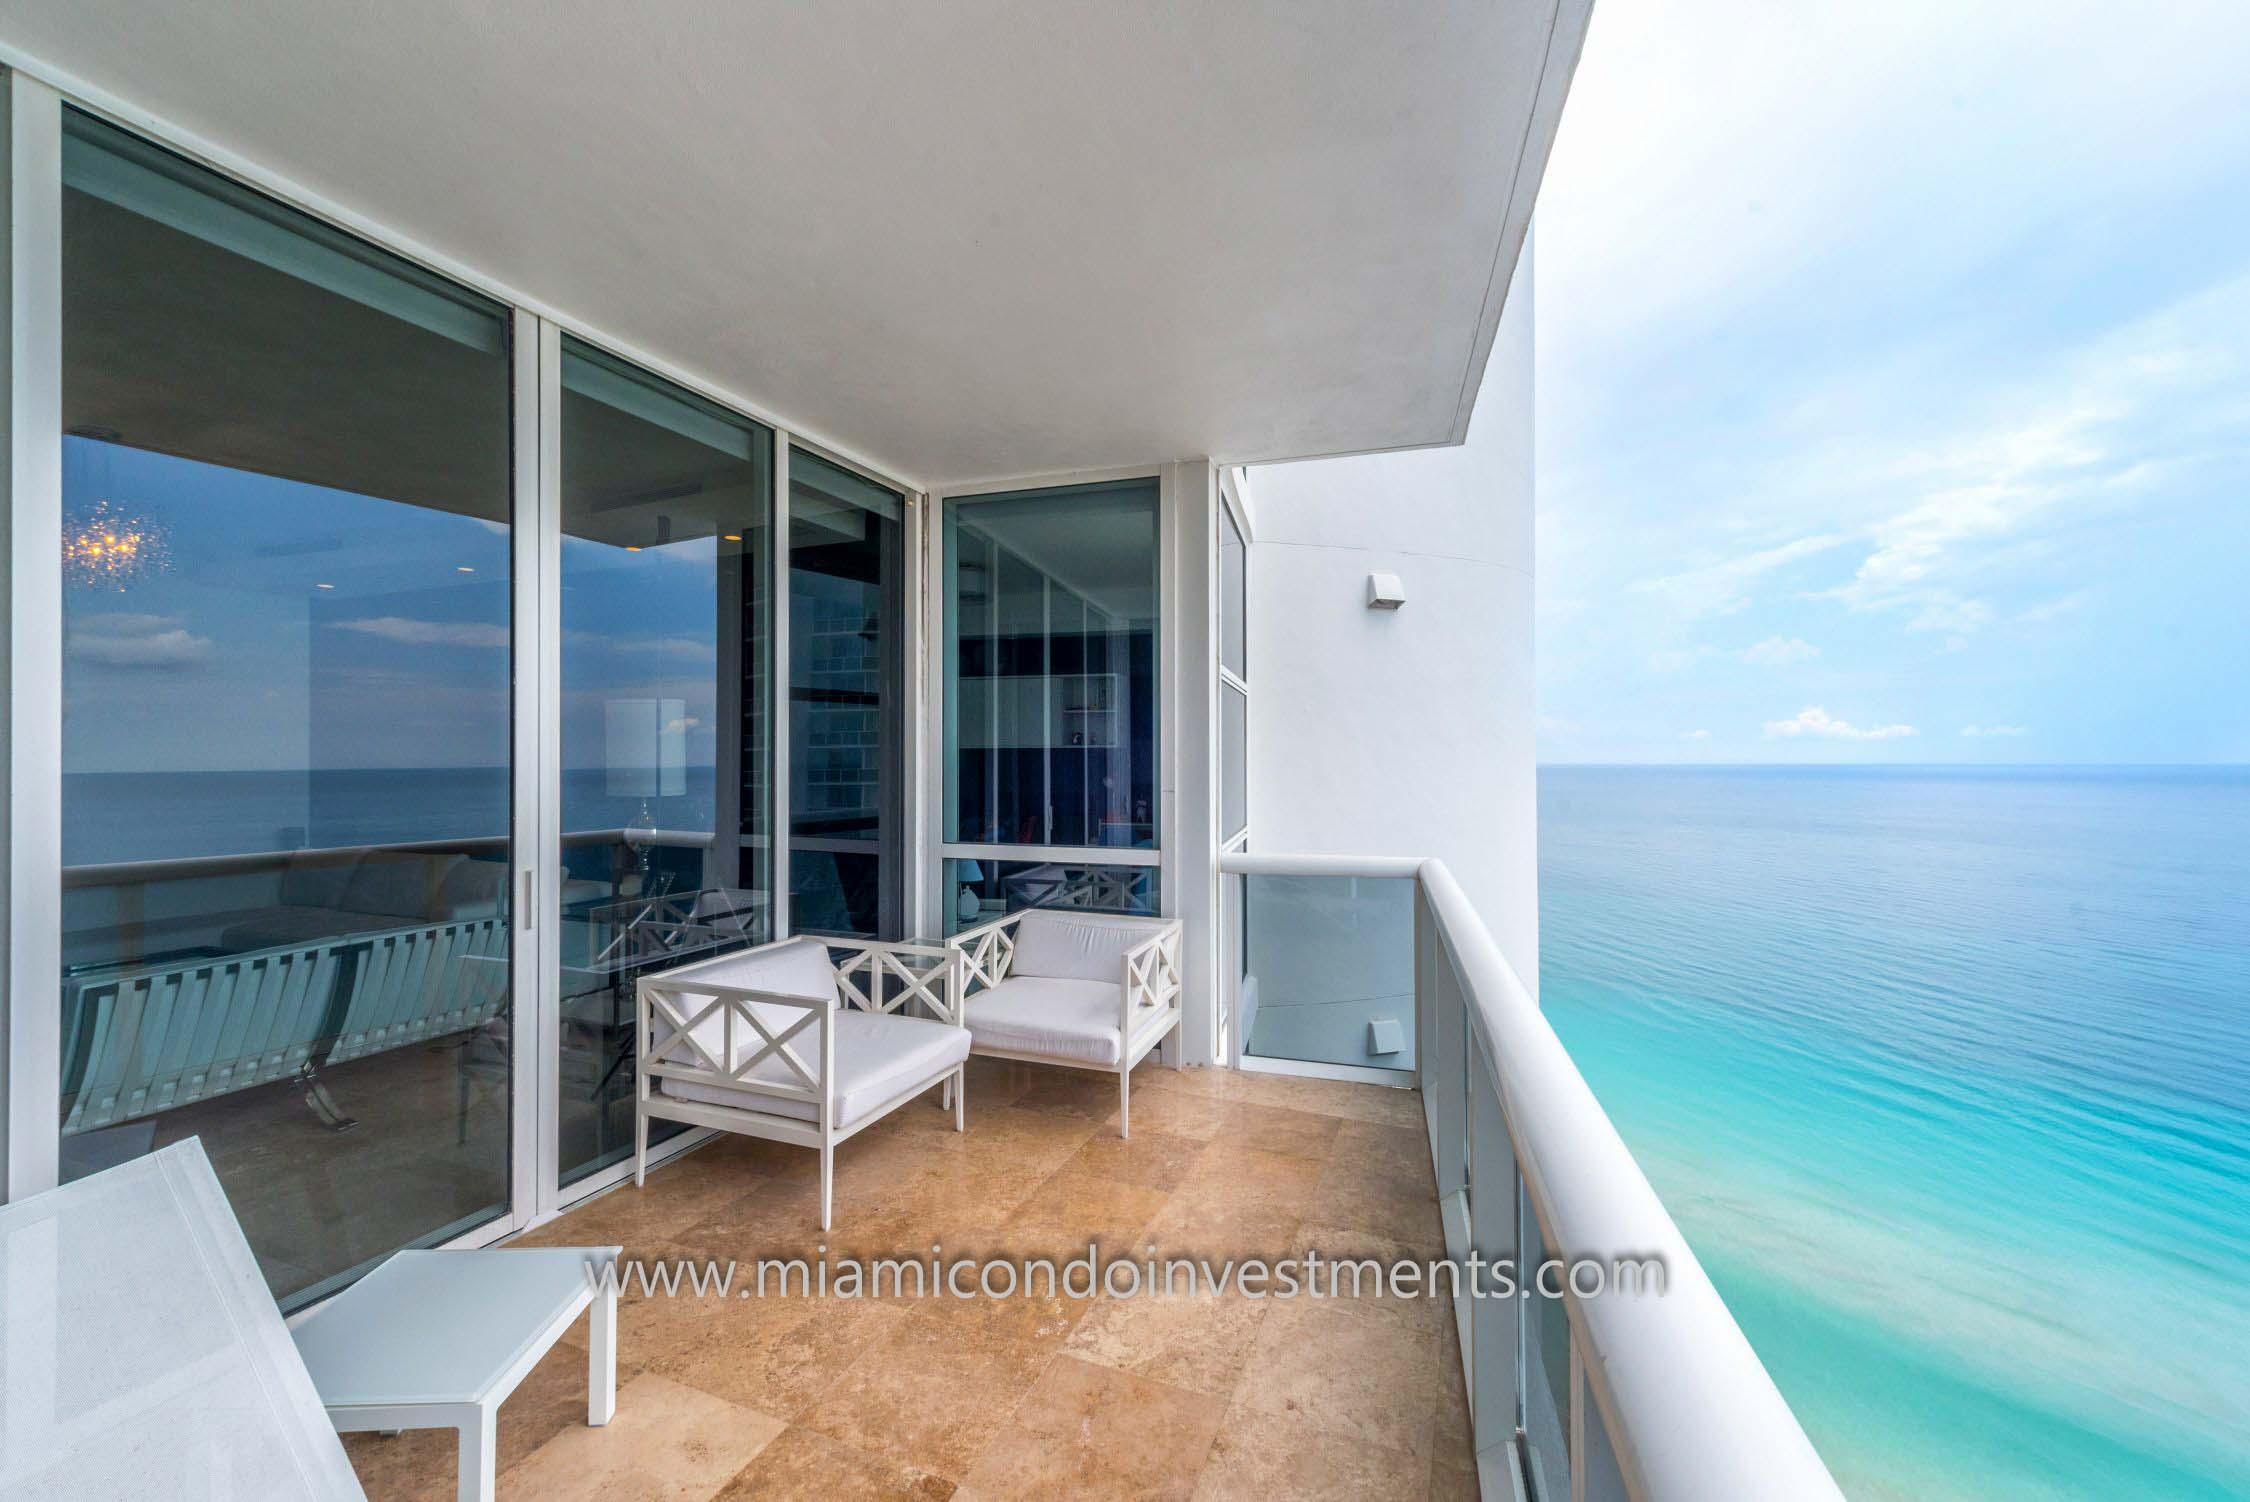 trump-palace-unit-3604-sunny-isles-beach-6